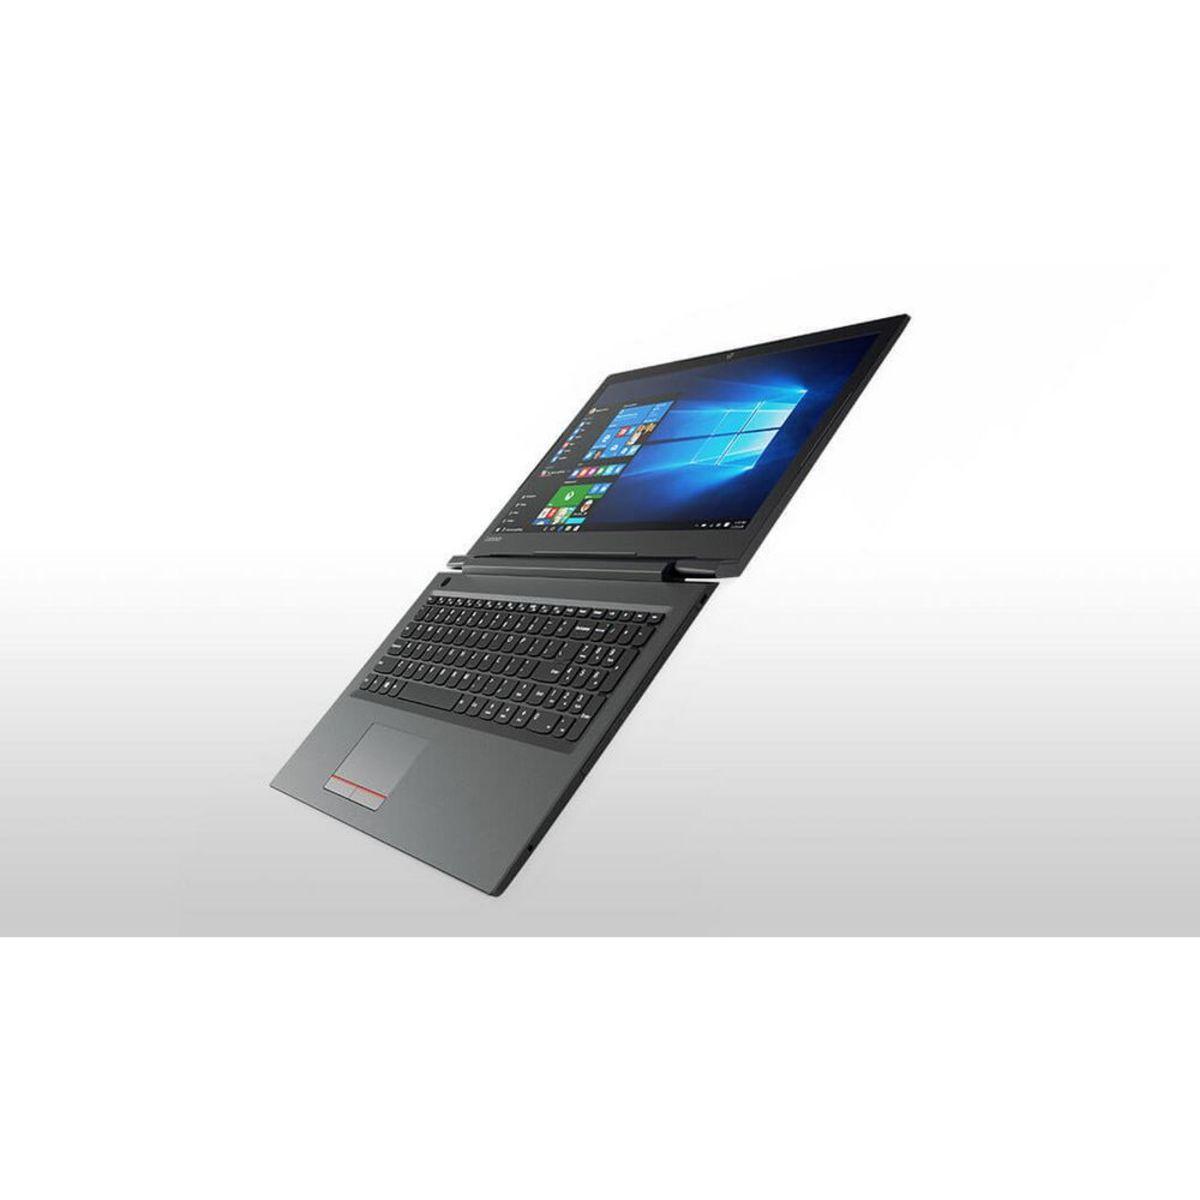 Bild 2 von Lenovo V110-15IAP, Notebook, 8GB RAM, 128GB SSD, Win 10